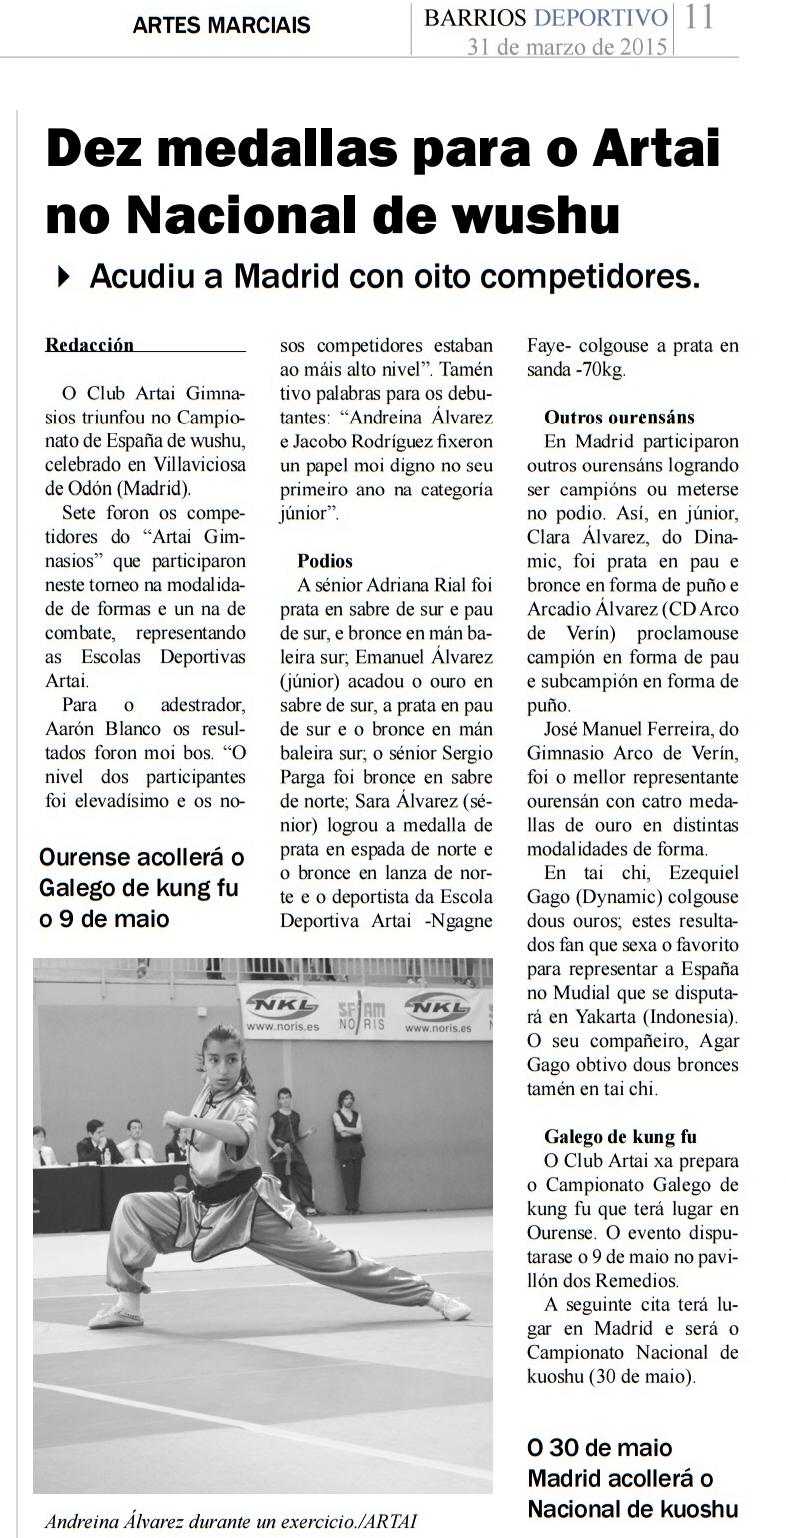 Barrios Deportivos 01/04/2015